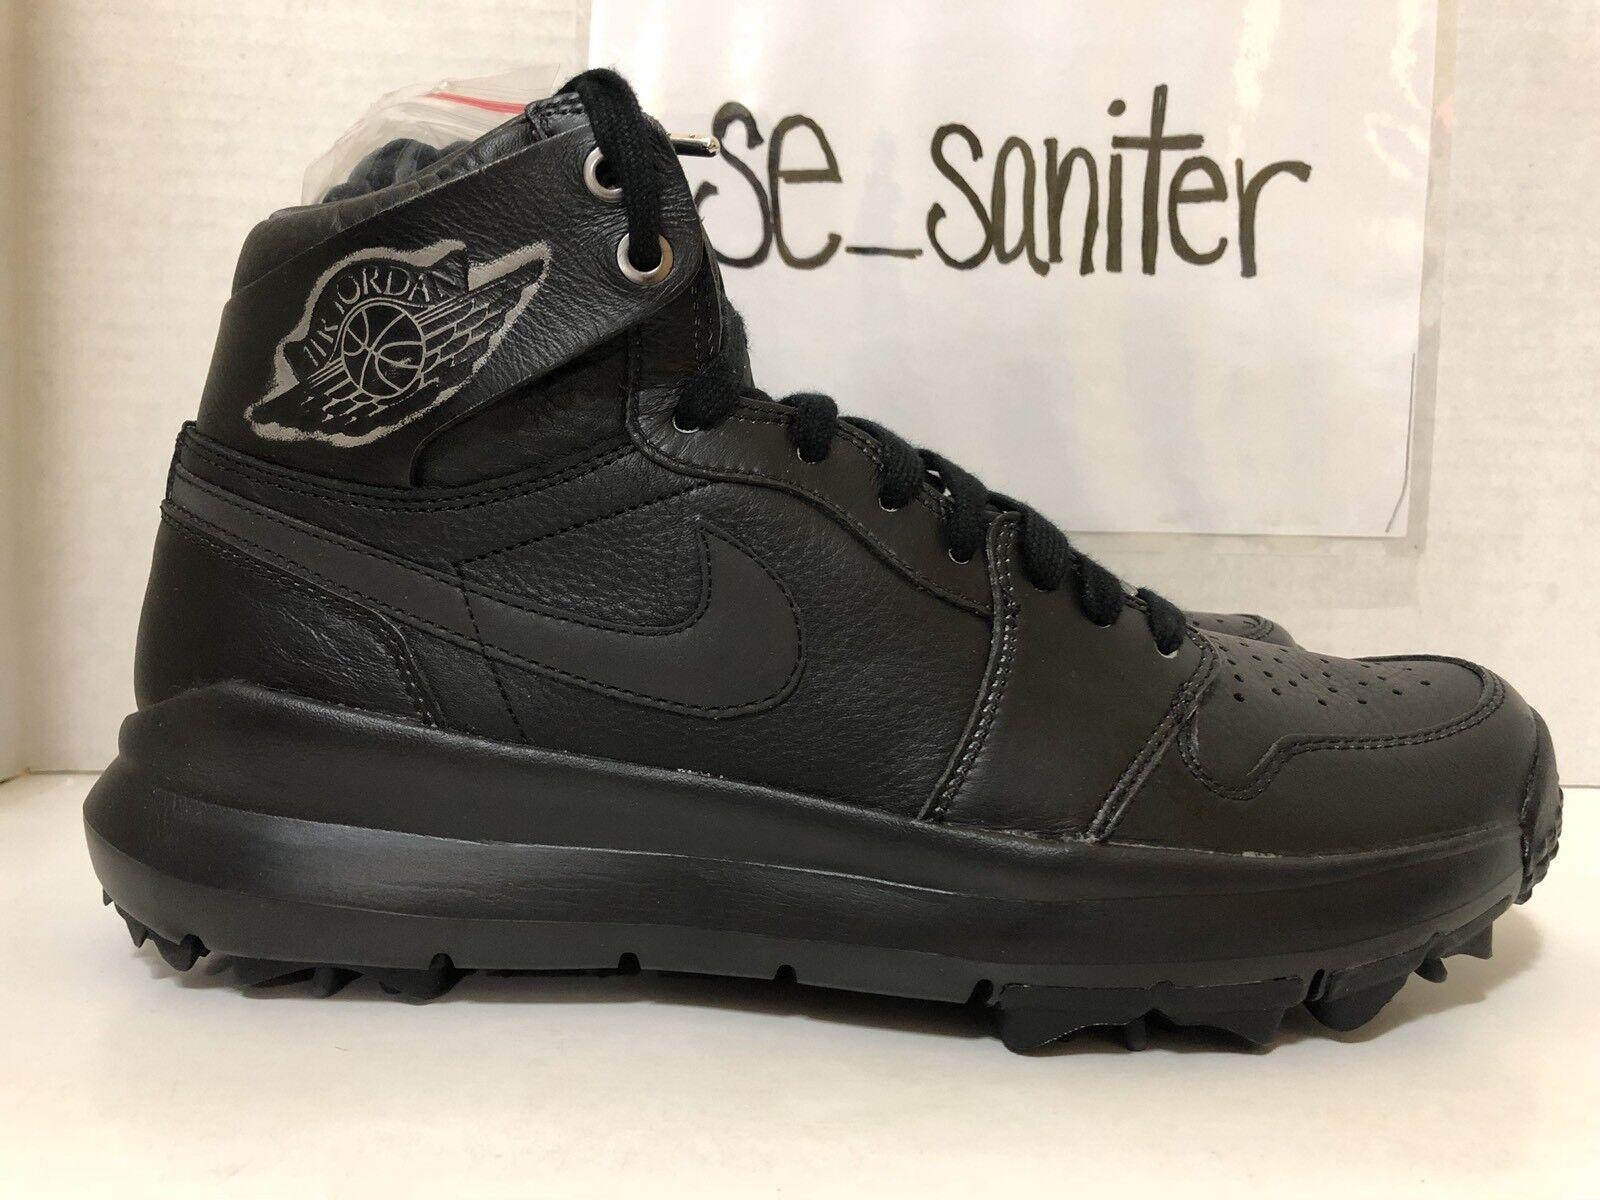 892777ee342 Nike Air Jordan 1 Retro Premium Triple Black Golf Cleats Ah2114 001 ...